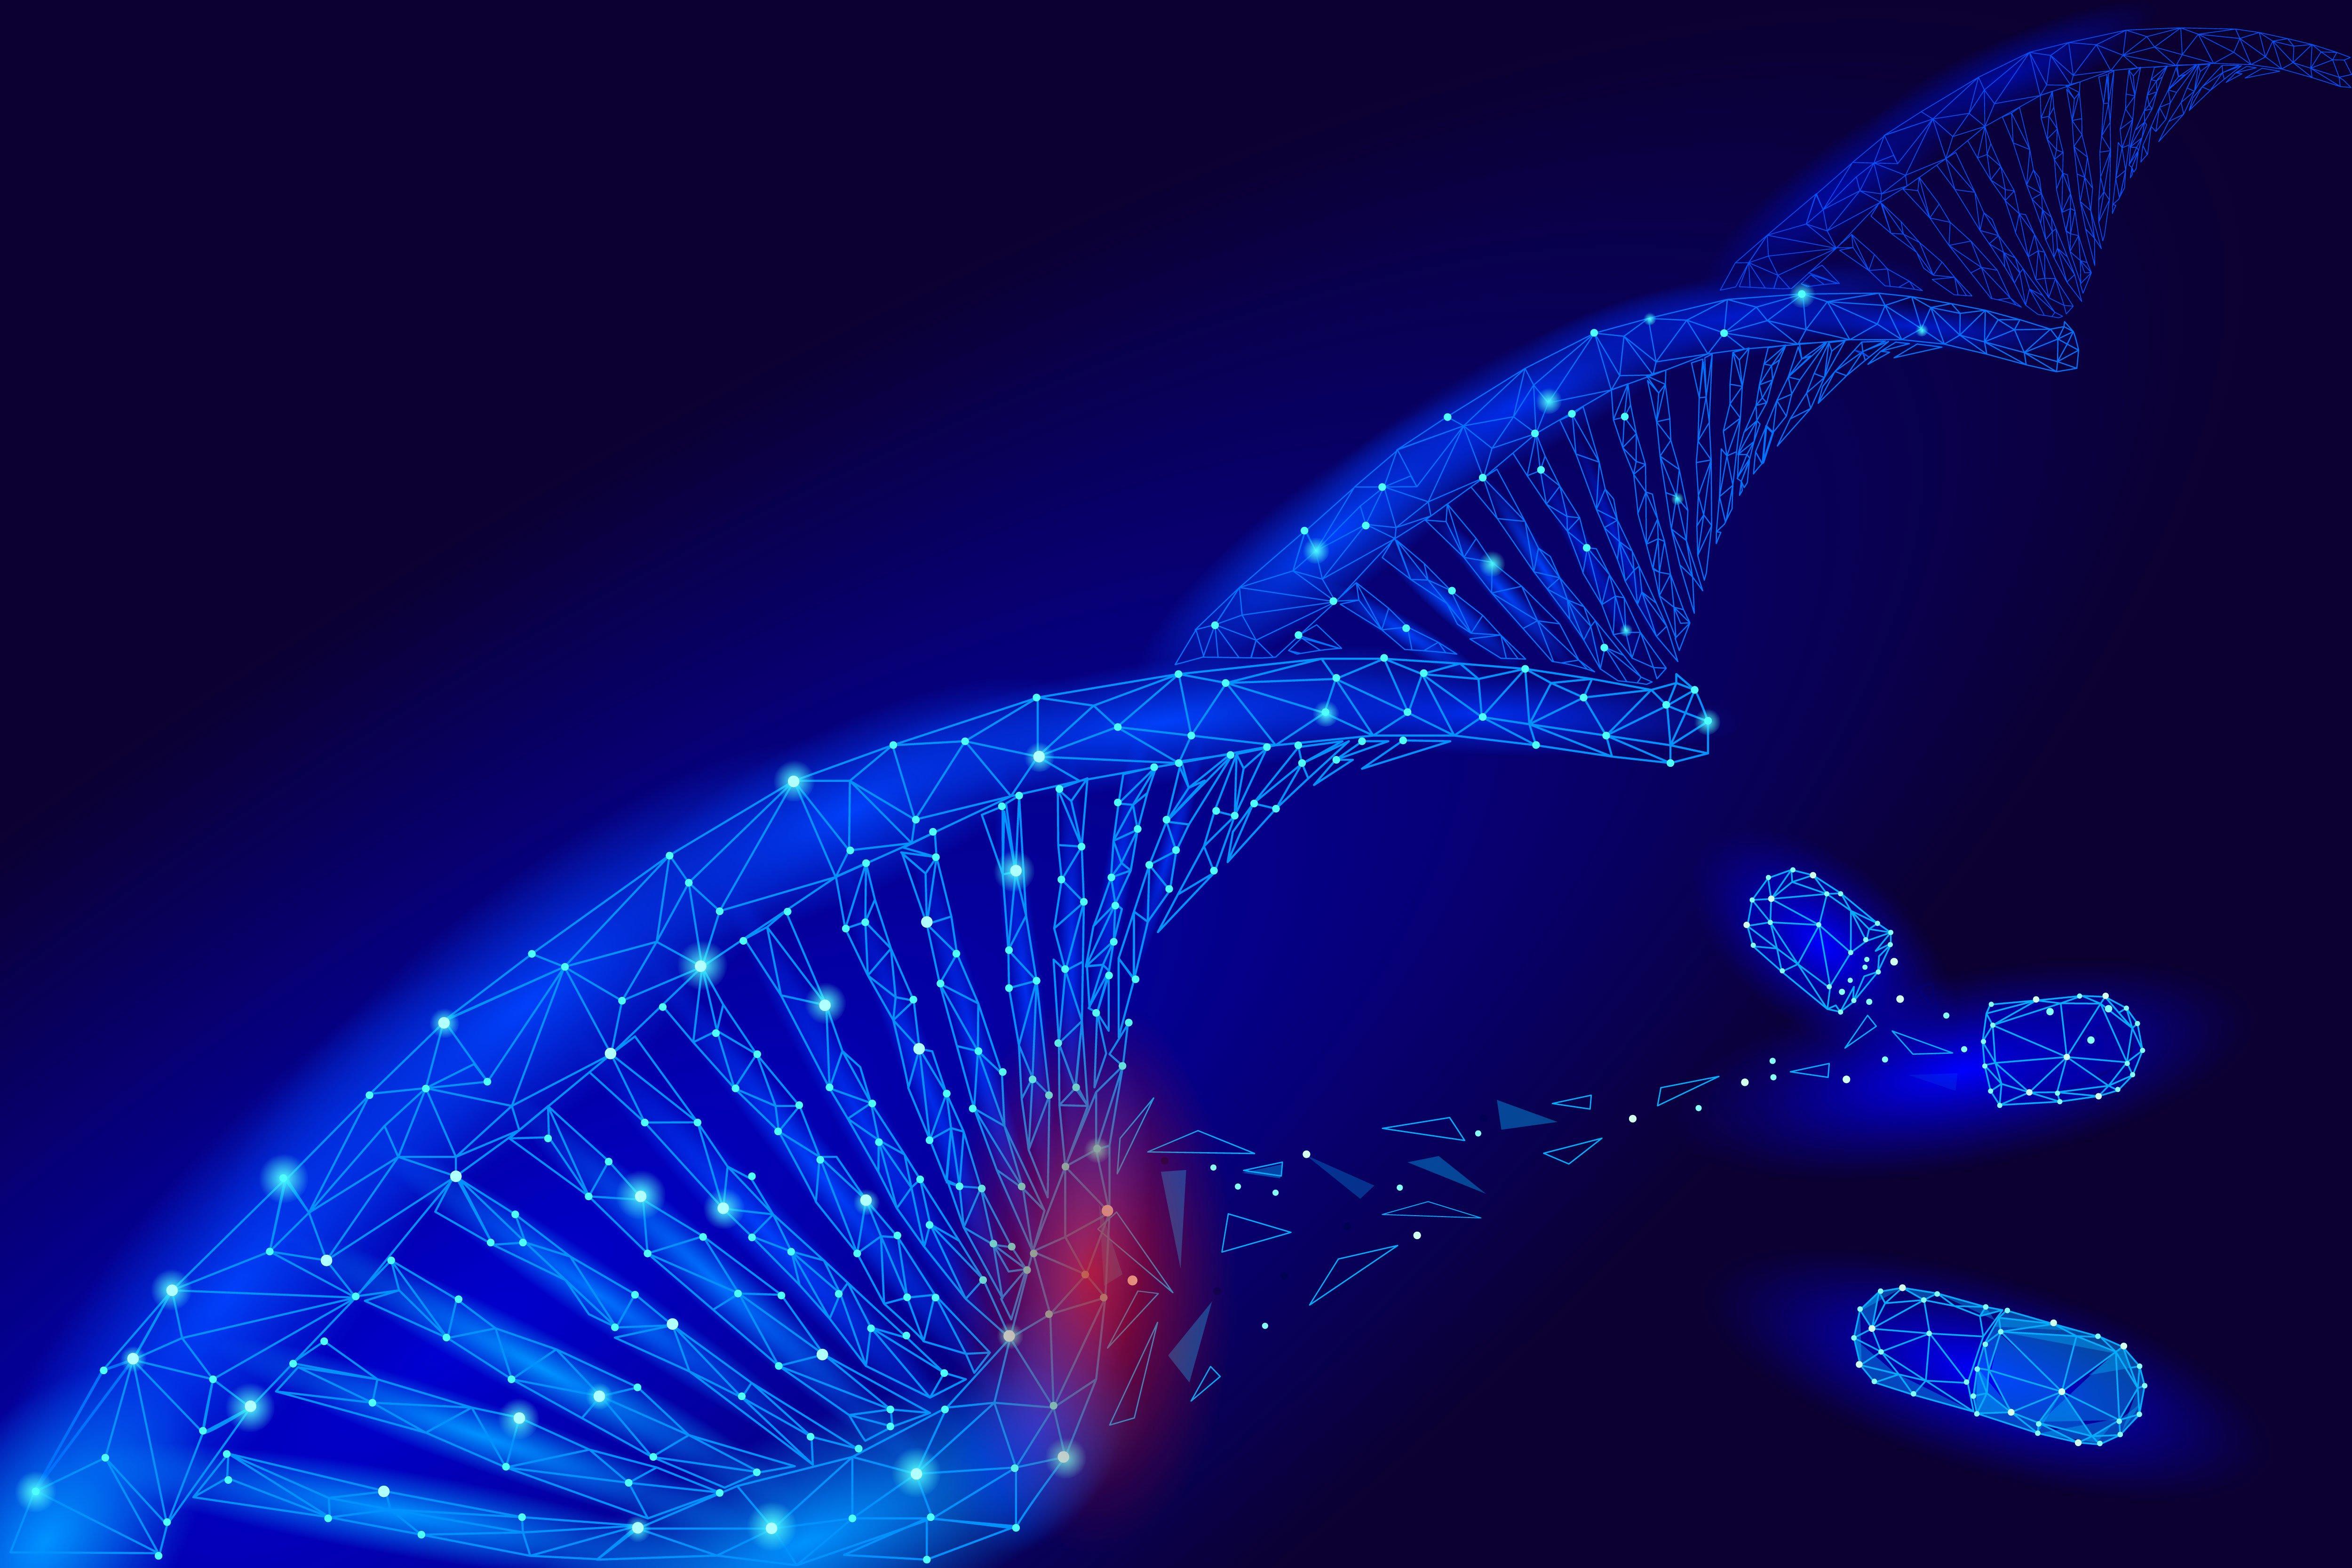 Genomic medicine